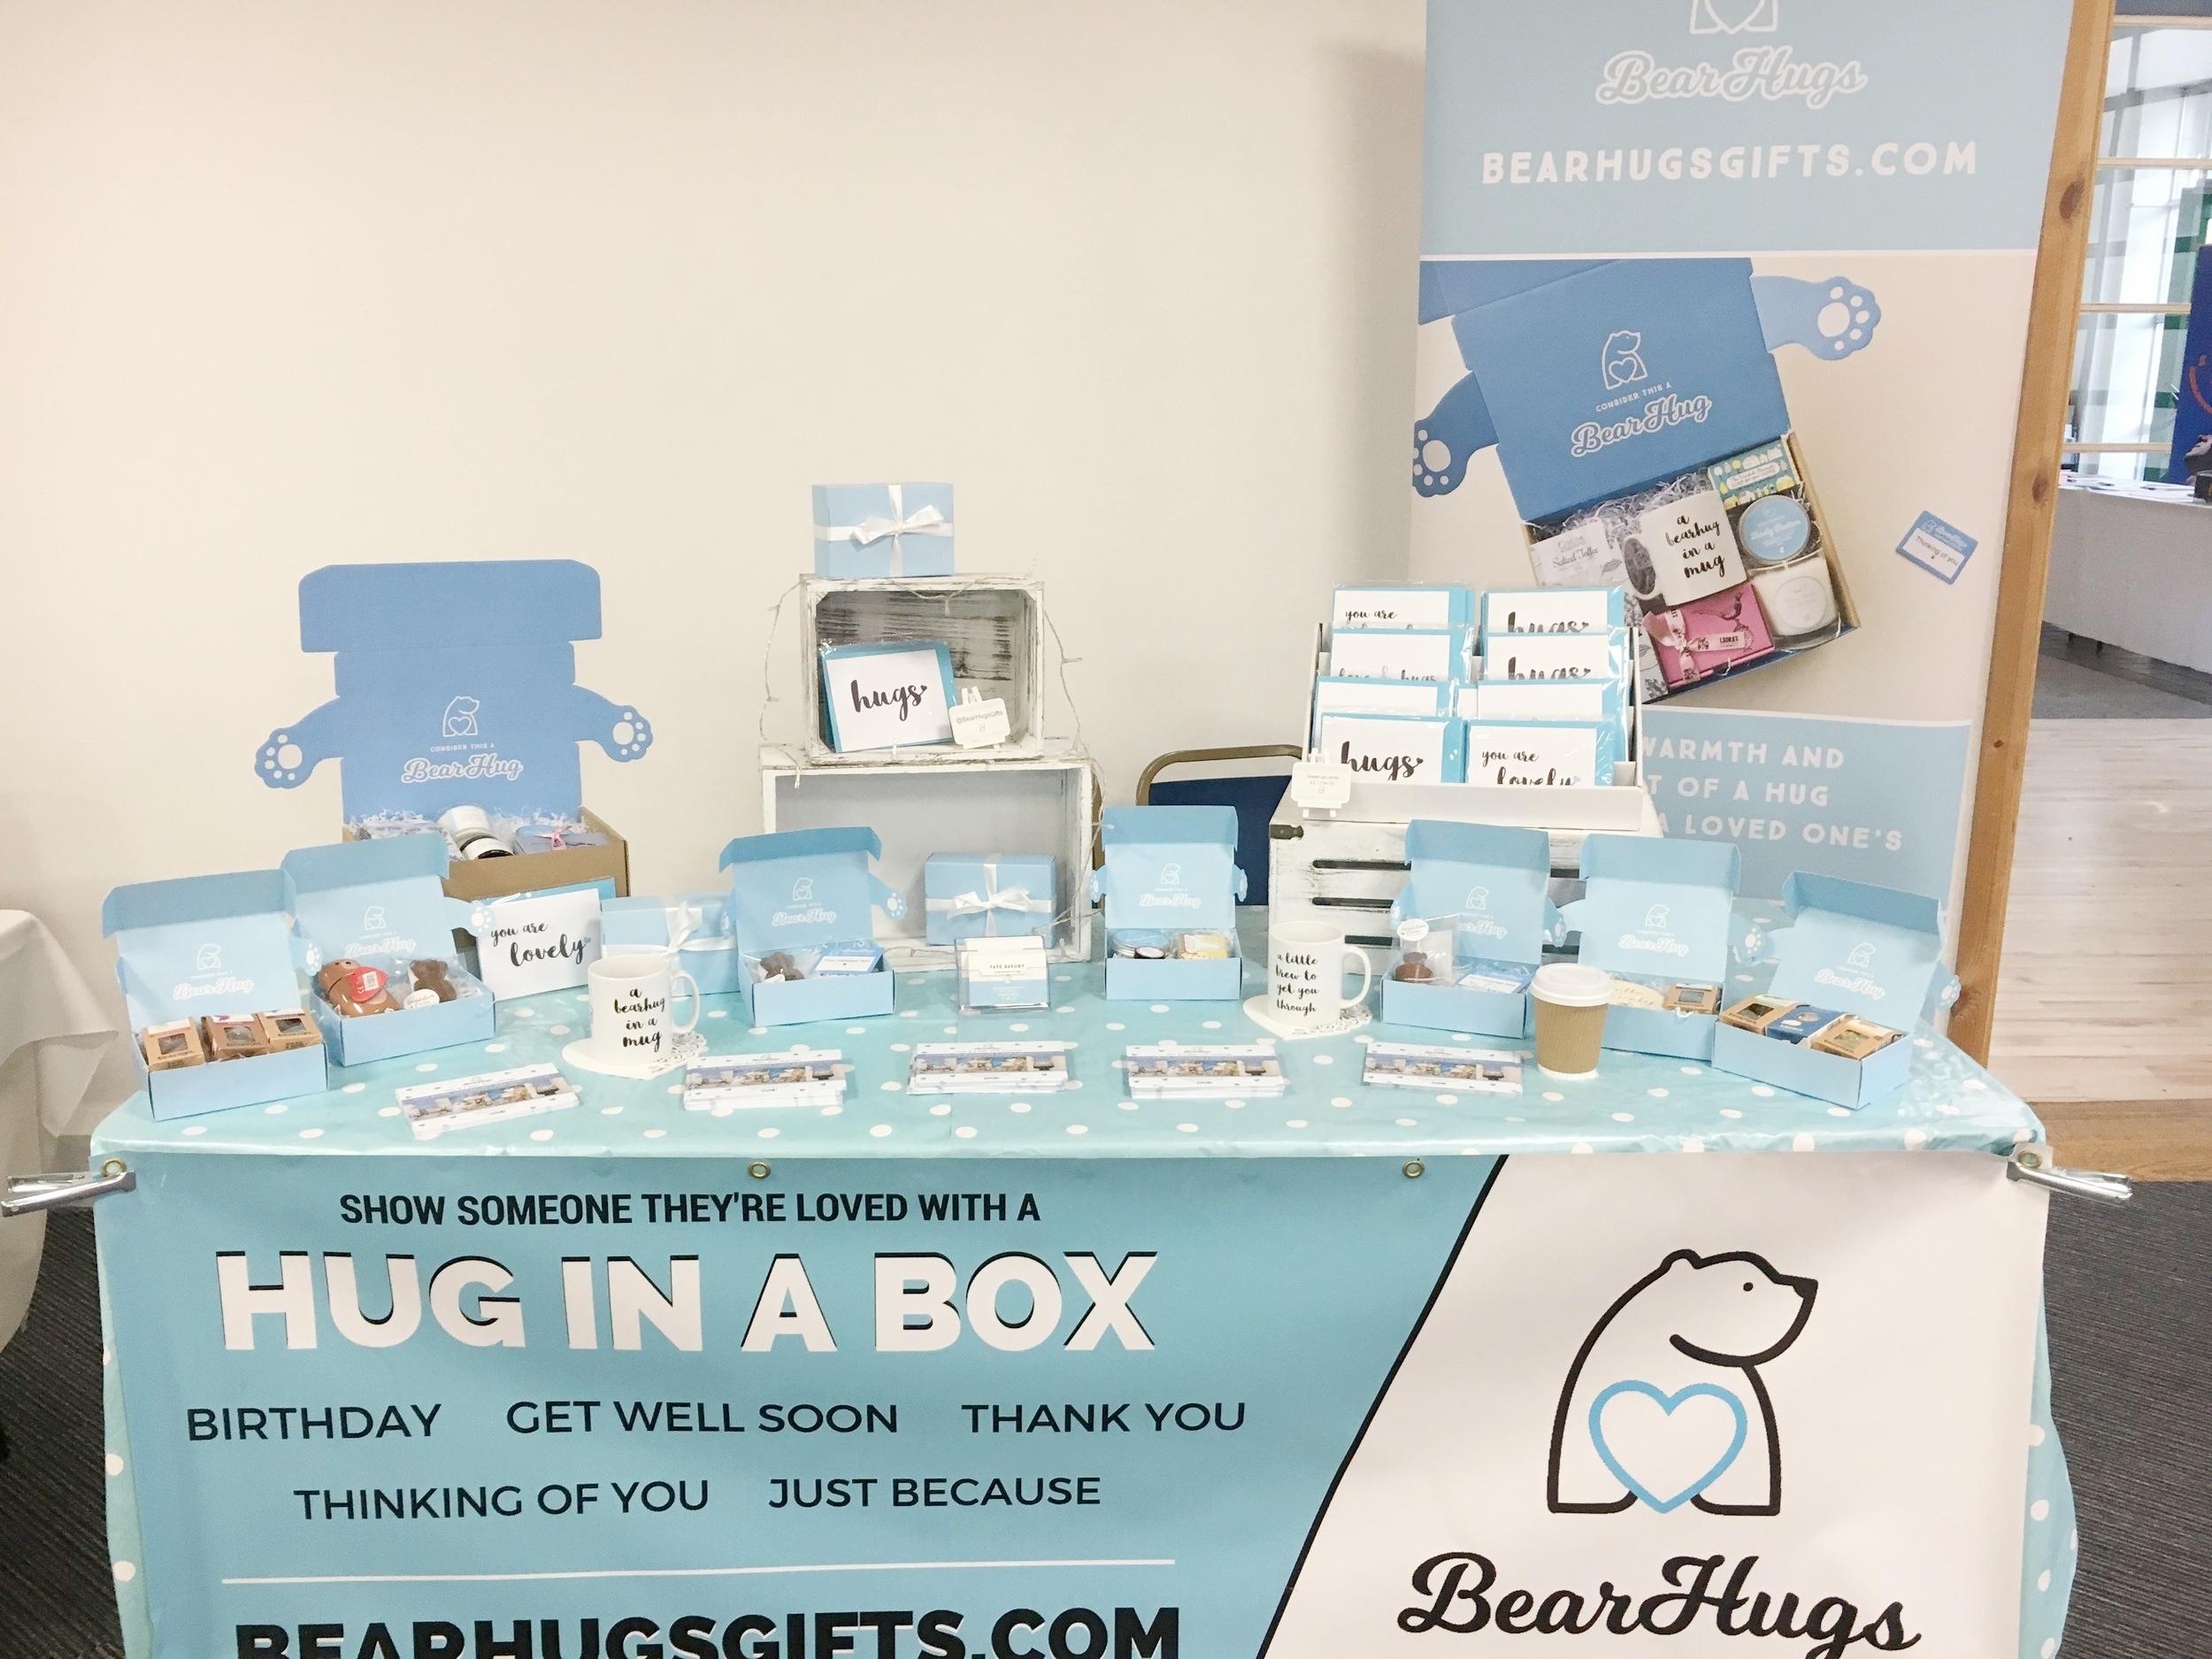 sheffield hallam venture matrix student pop up shop for bearhugs gifts